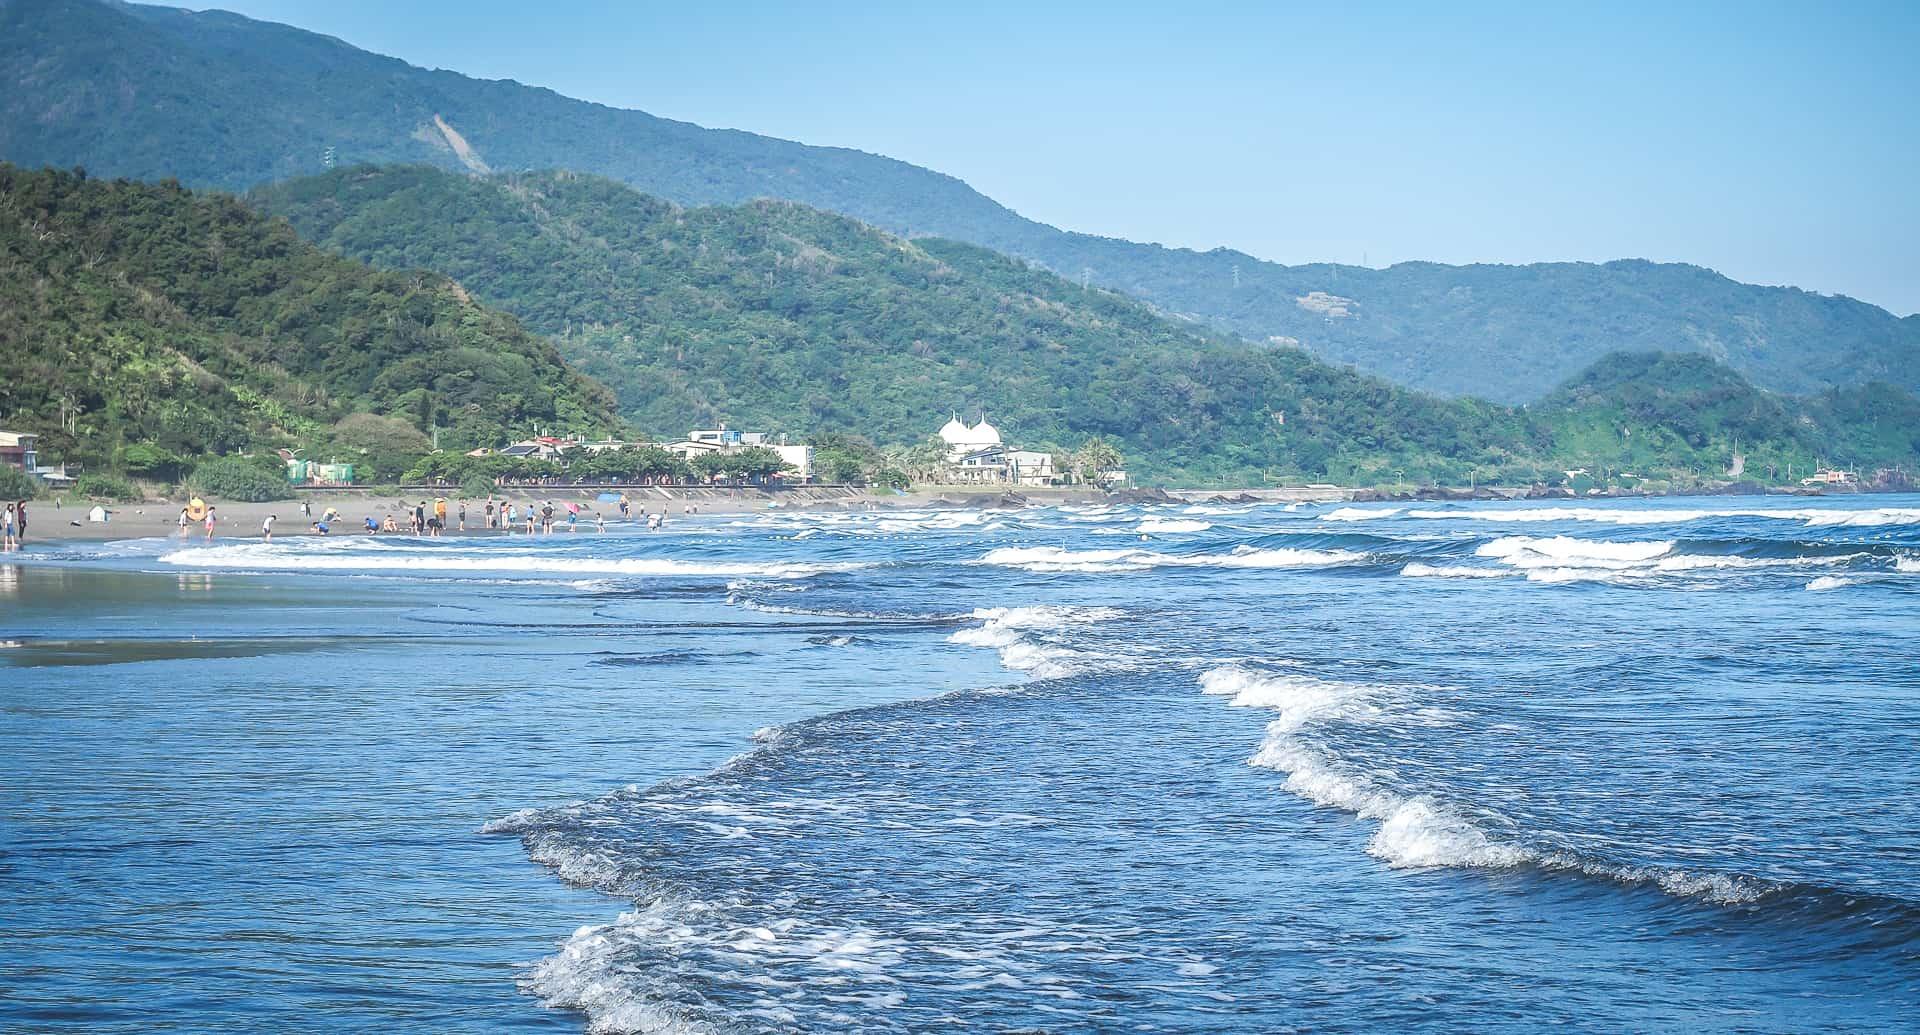 Visiting Taipei & Taiwan in August 2020